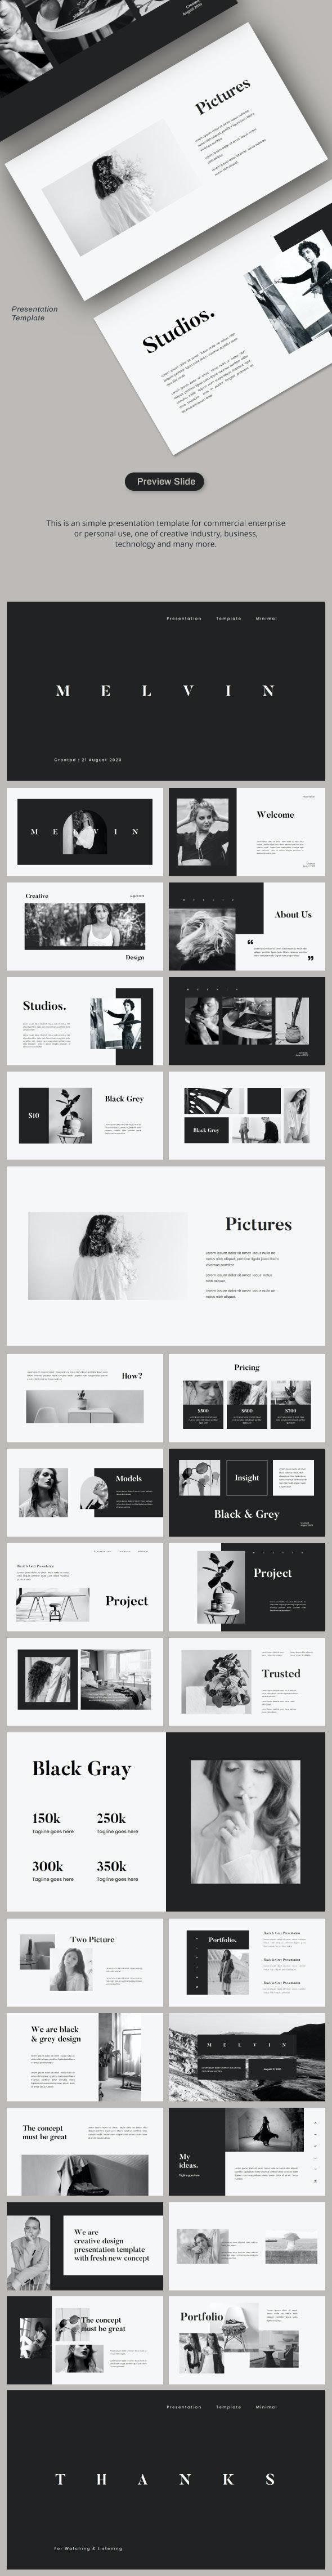 Black Grey - Keynote - Keynote Templates Presentation Templates